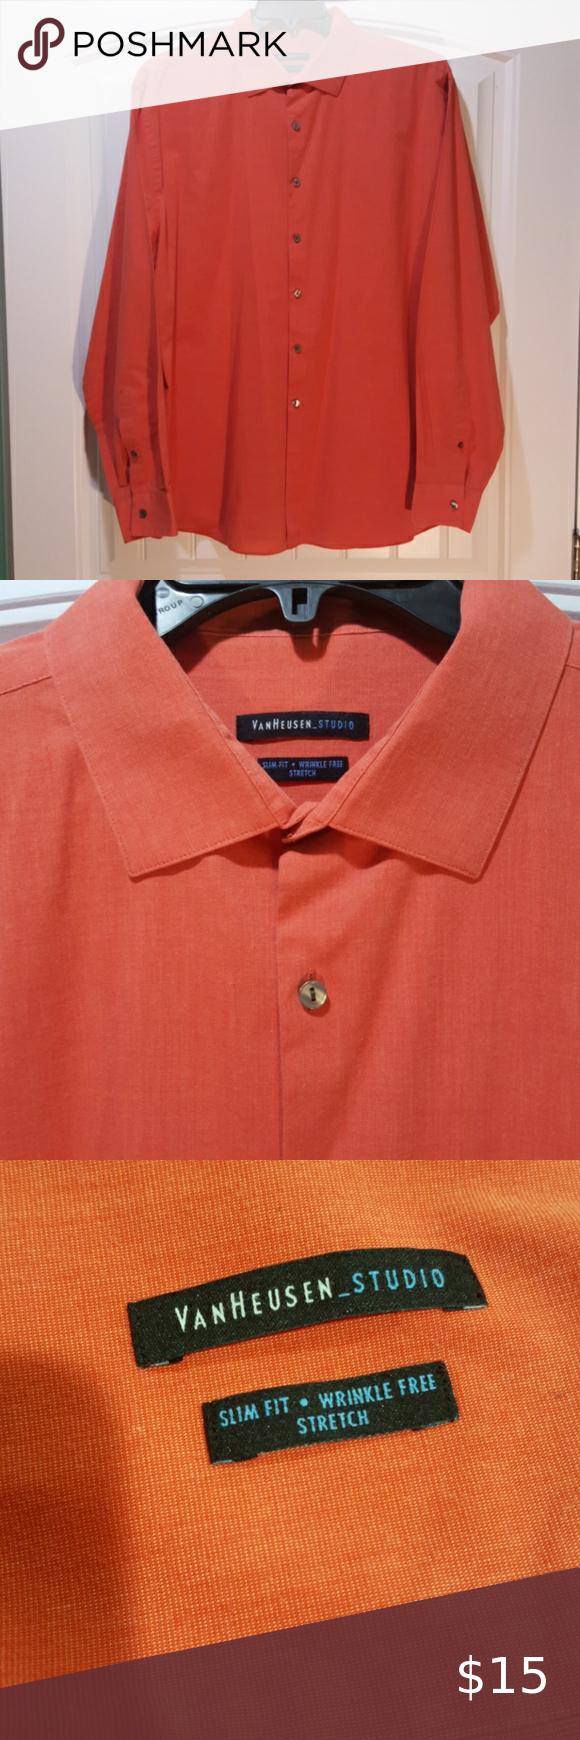 Van Heusen Studio Button Down 17 5 36 Such A Nice Shirt For The Man Who S Not Afraid Burnt Orange Dress Shirt Mens Shirt Dress Black Button Up Shirt [ 1740 x 580 Pixel ]